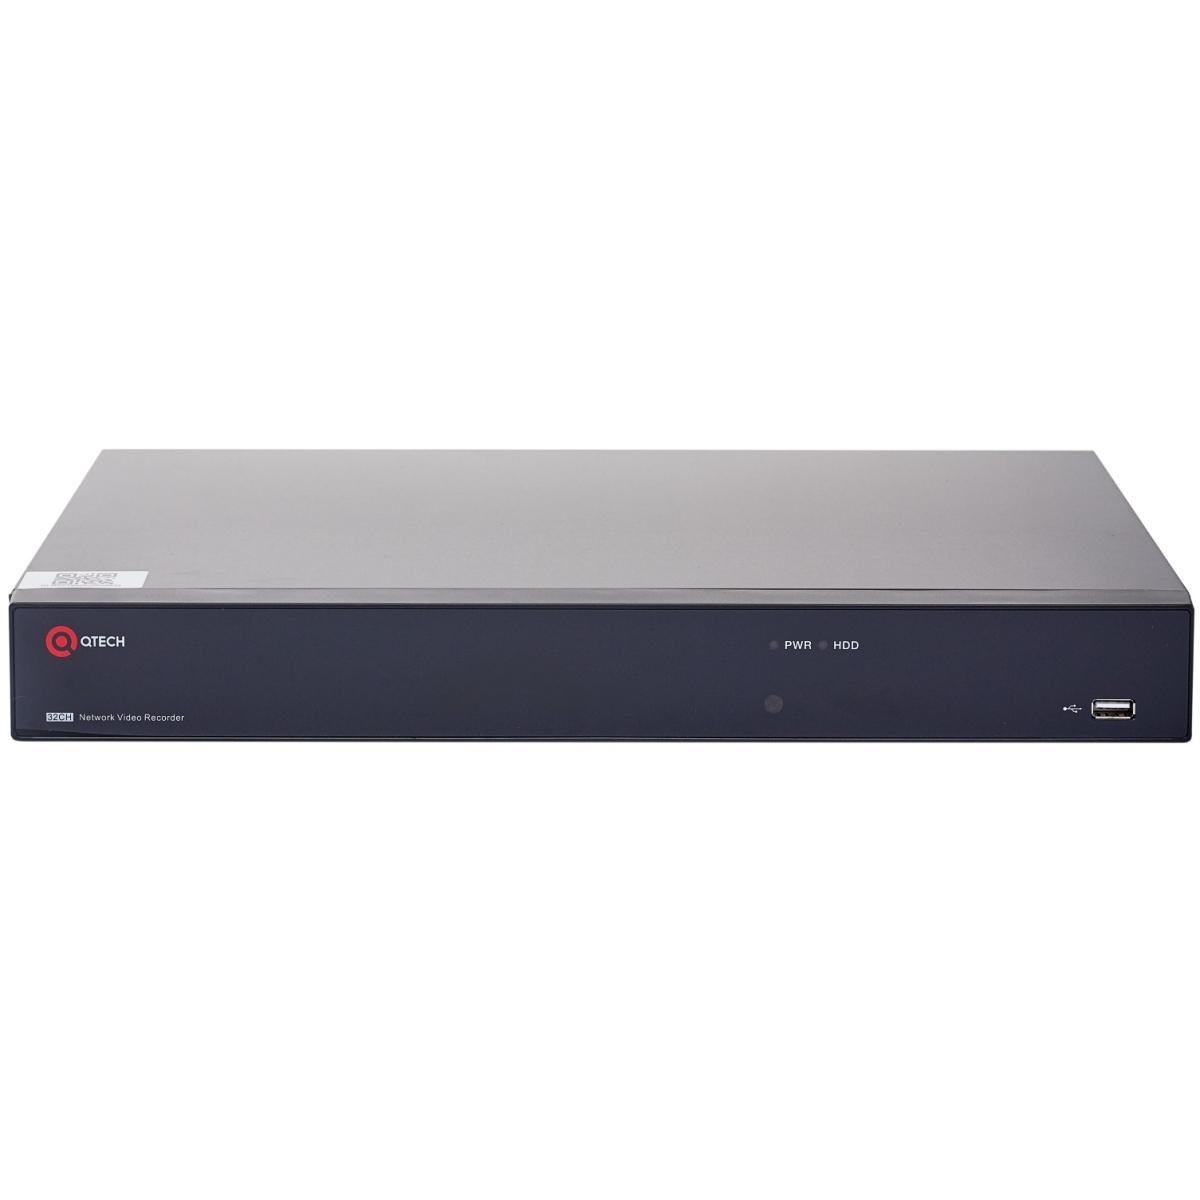 IP Видеорегистратор (NVR) QTECH QTECH QVC-NVR-232/8MP